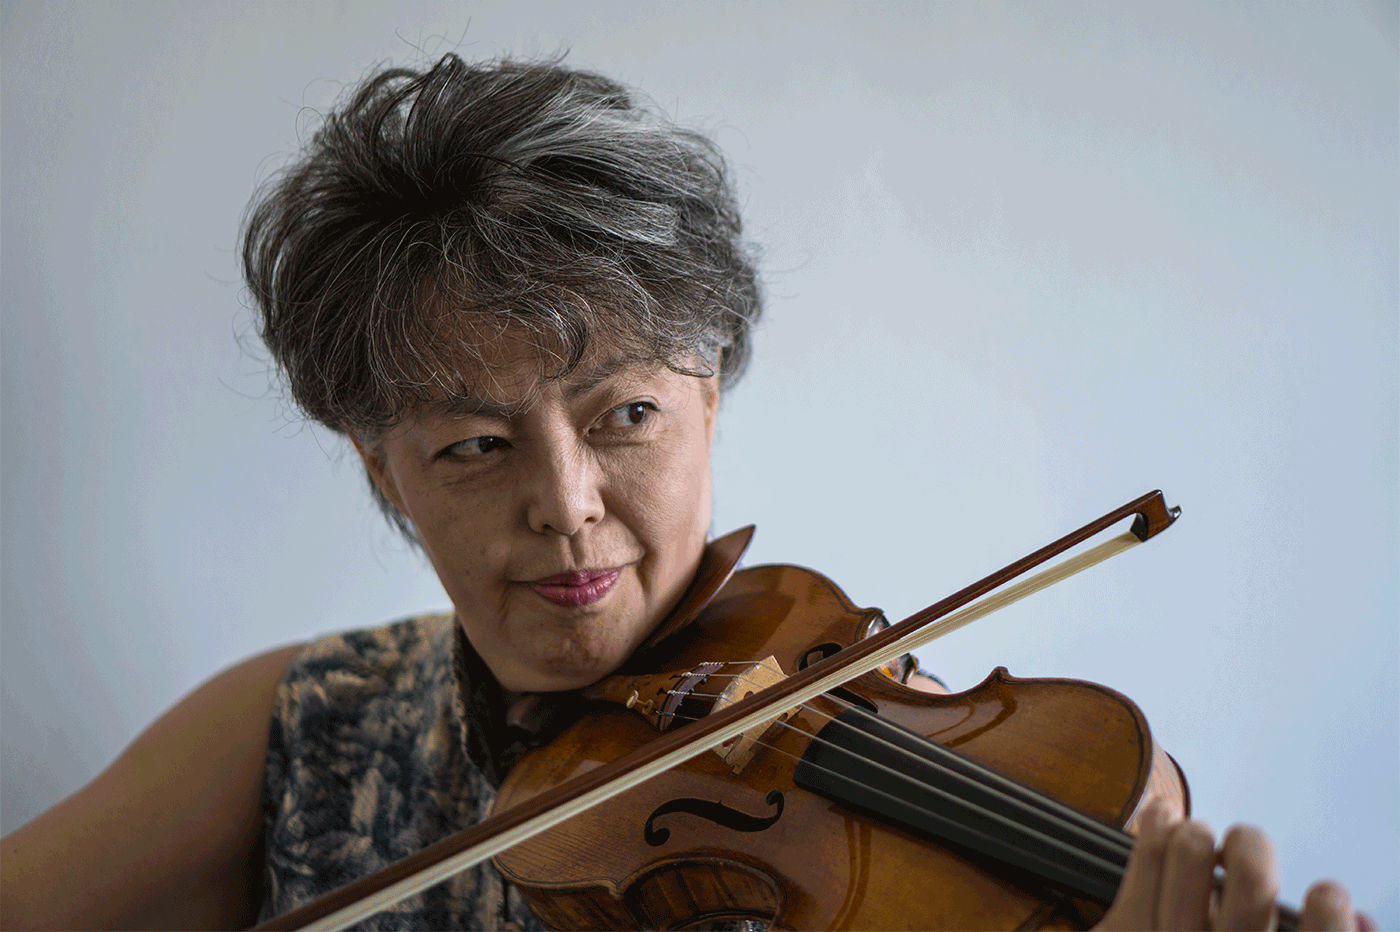 yuzuko_horigome_violinist_japanese_concours_elisabeth